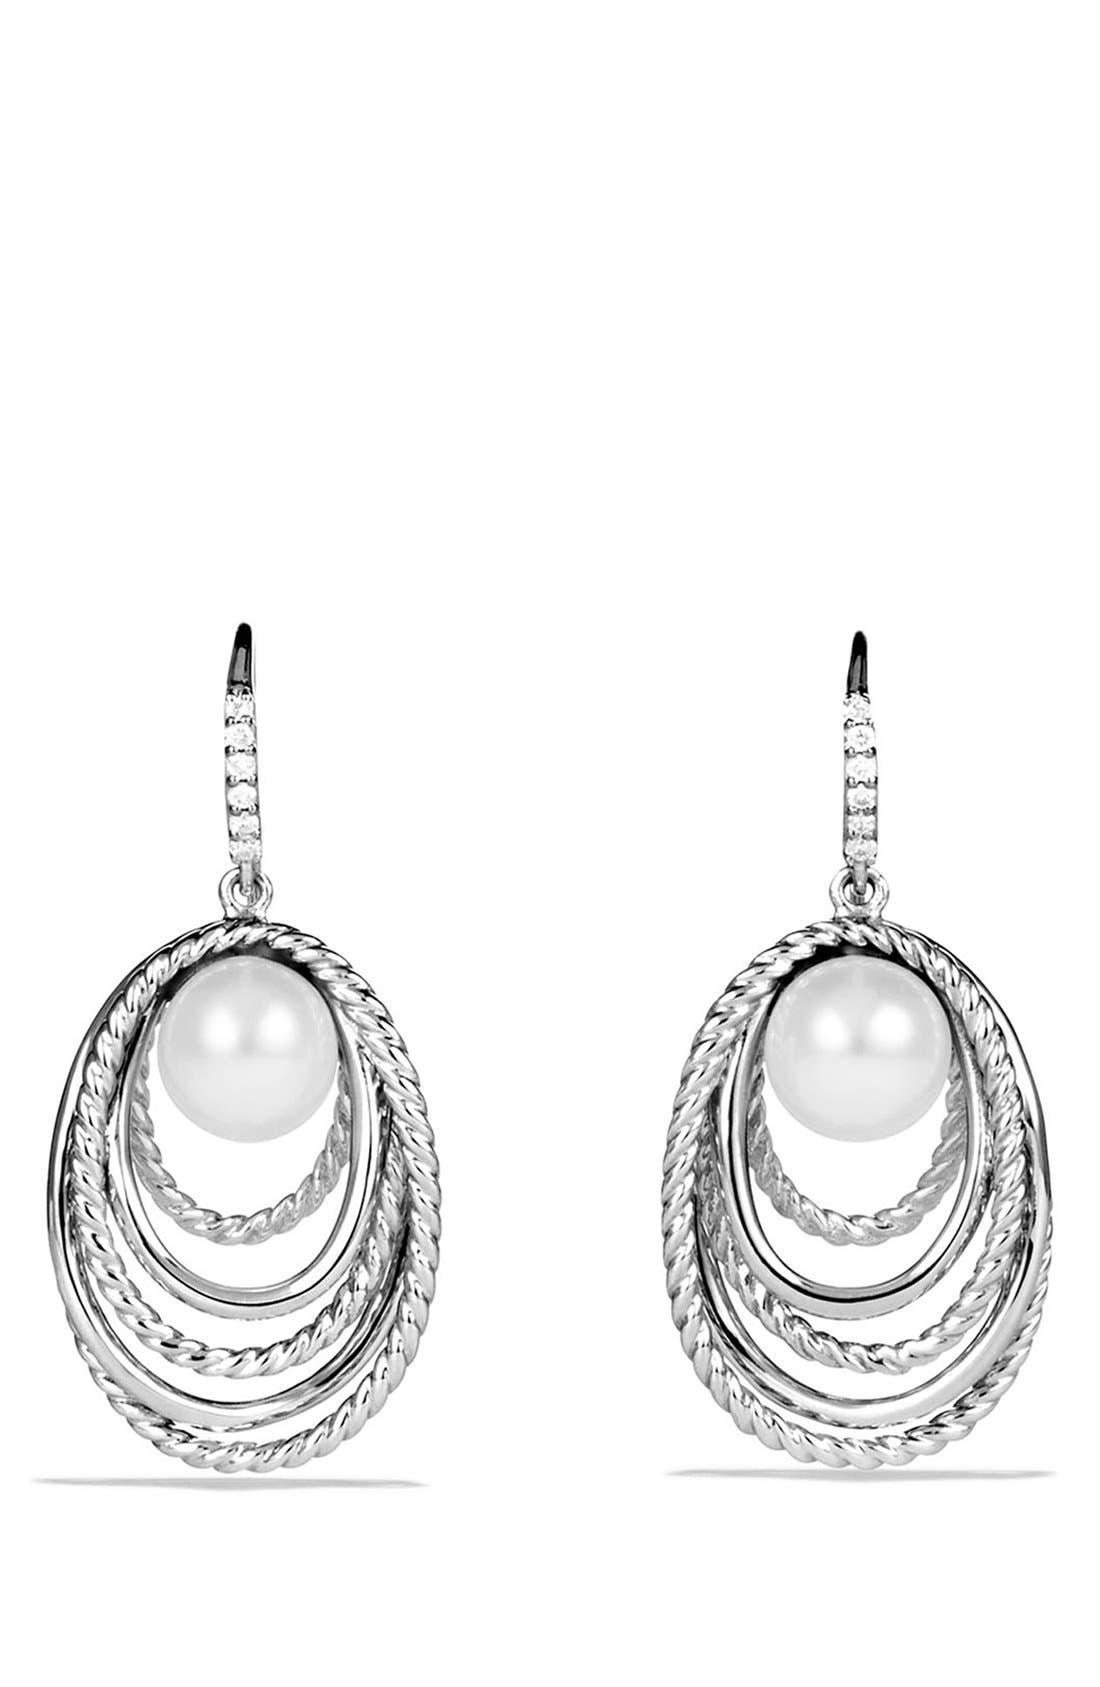 David Yurman 'Crossover' Pearl Drop Earrings with Diamonds